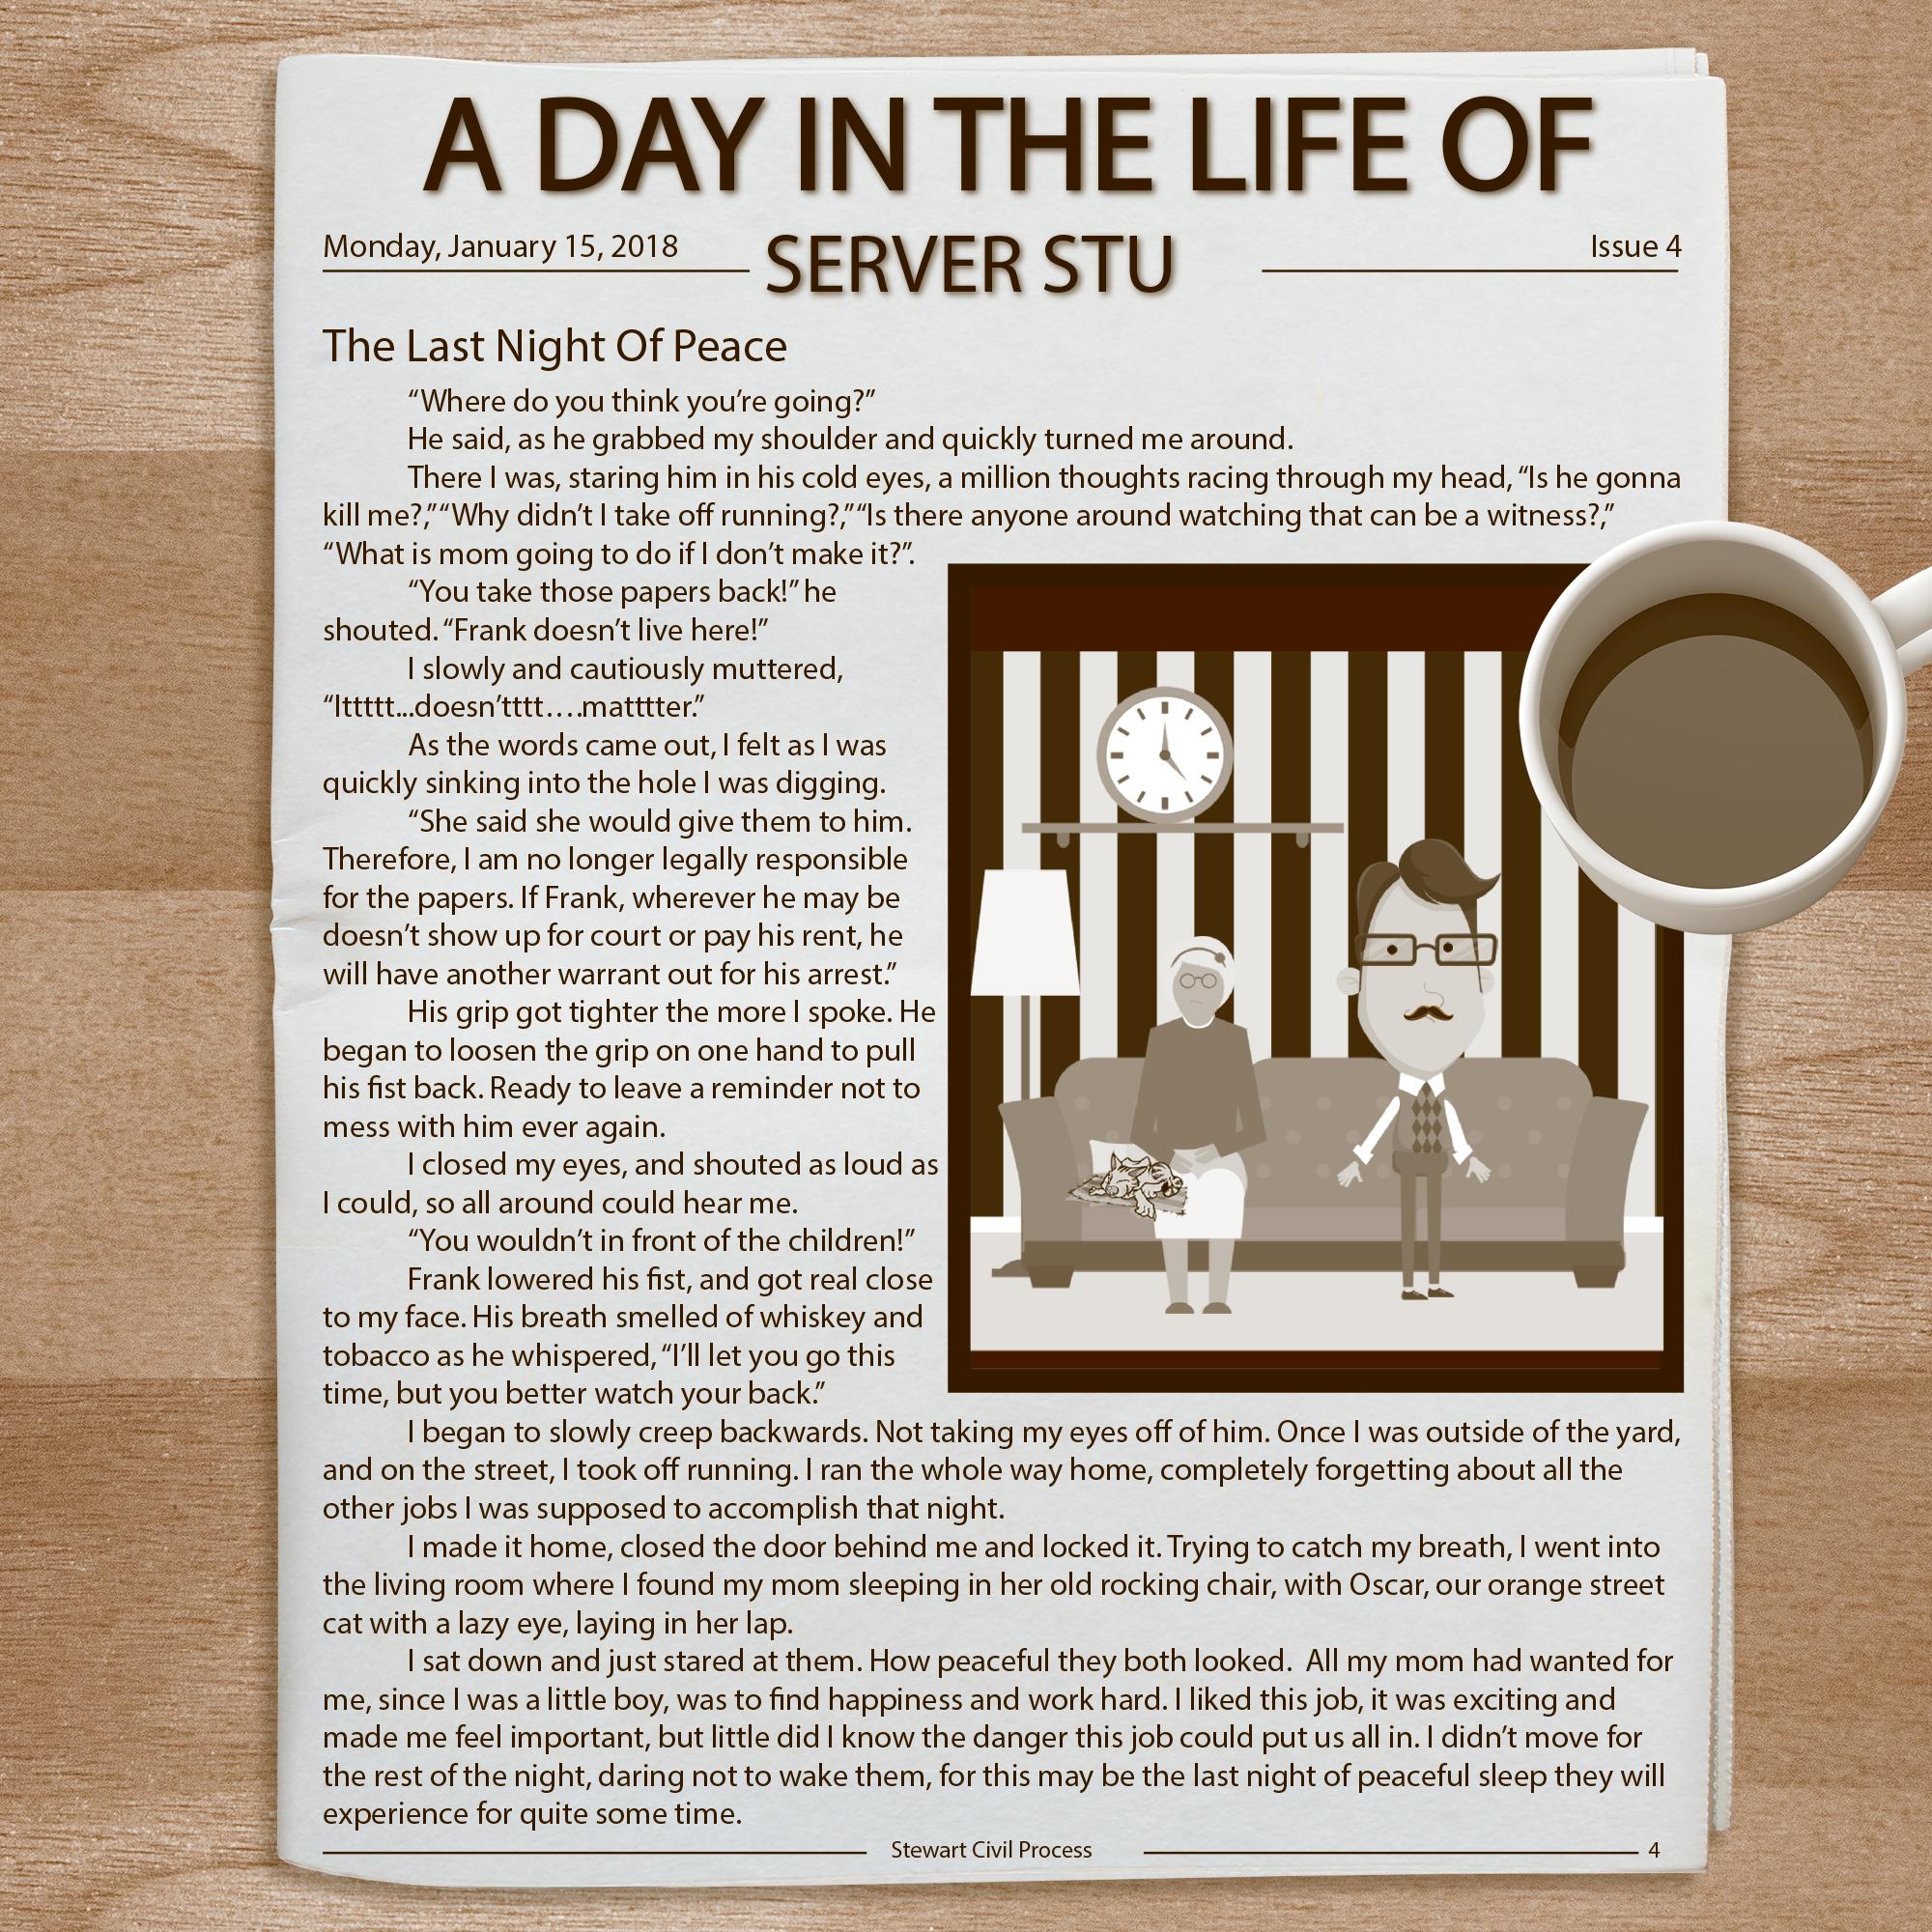 ServerStu_Newspaper4.png